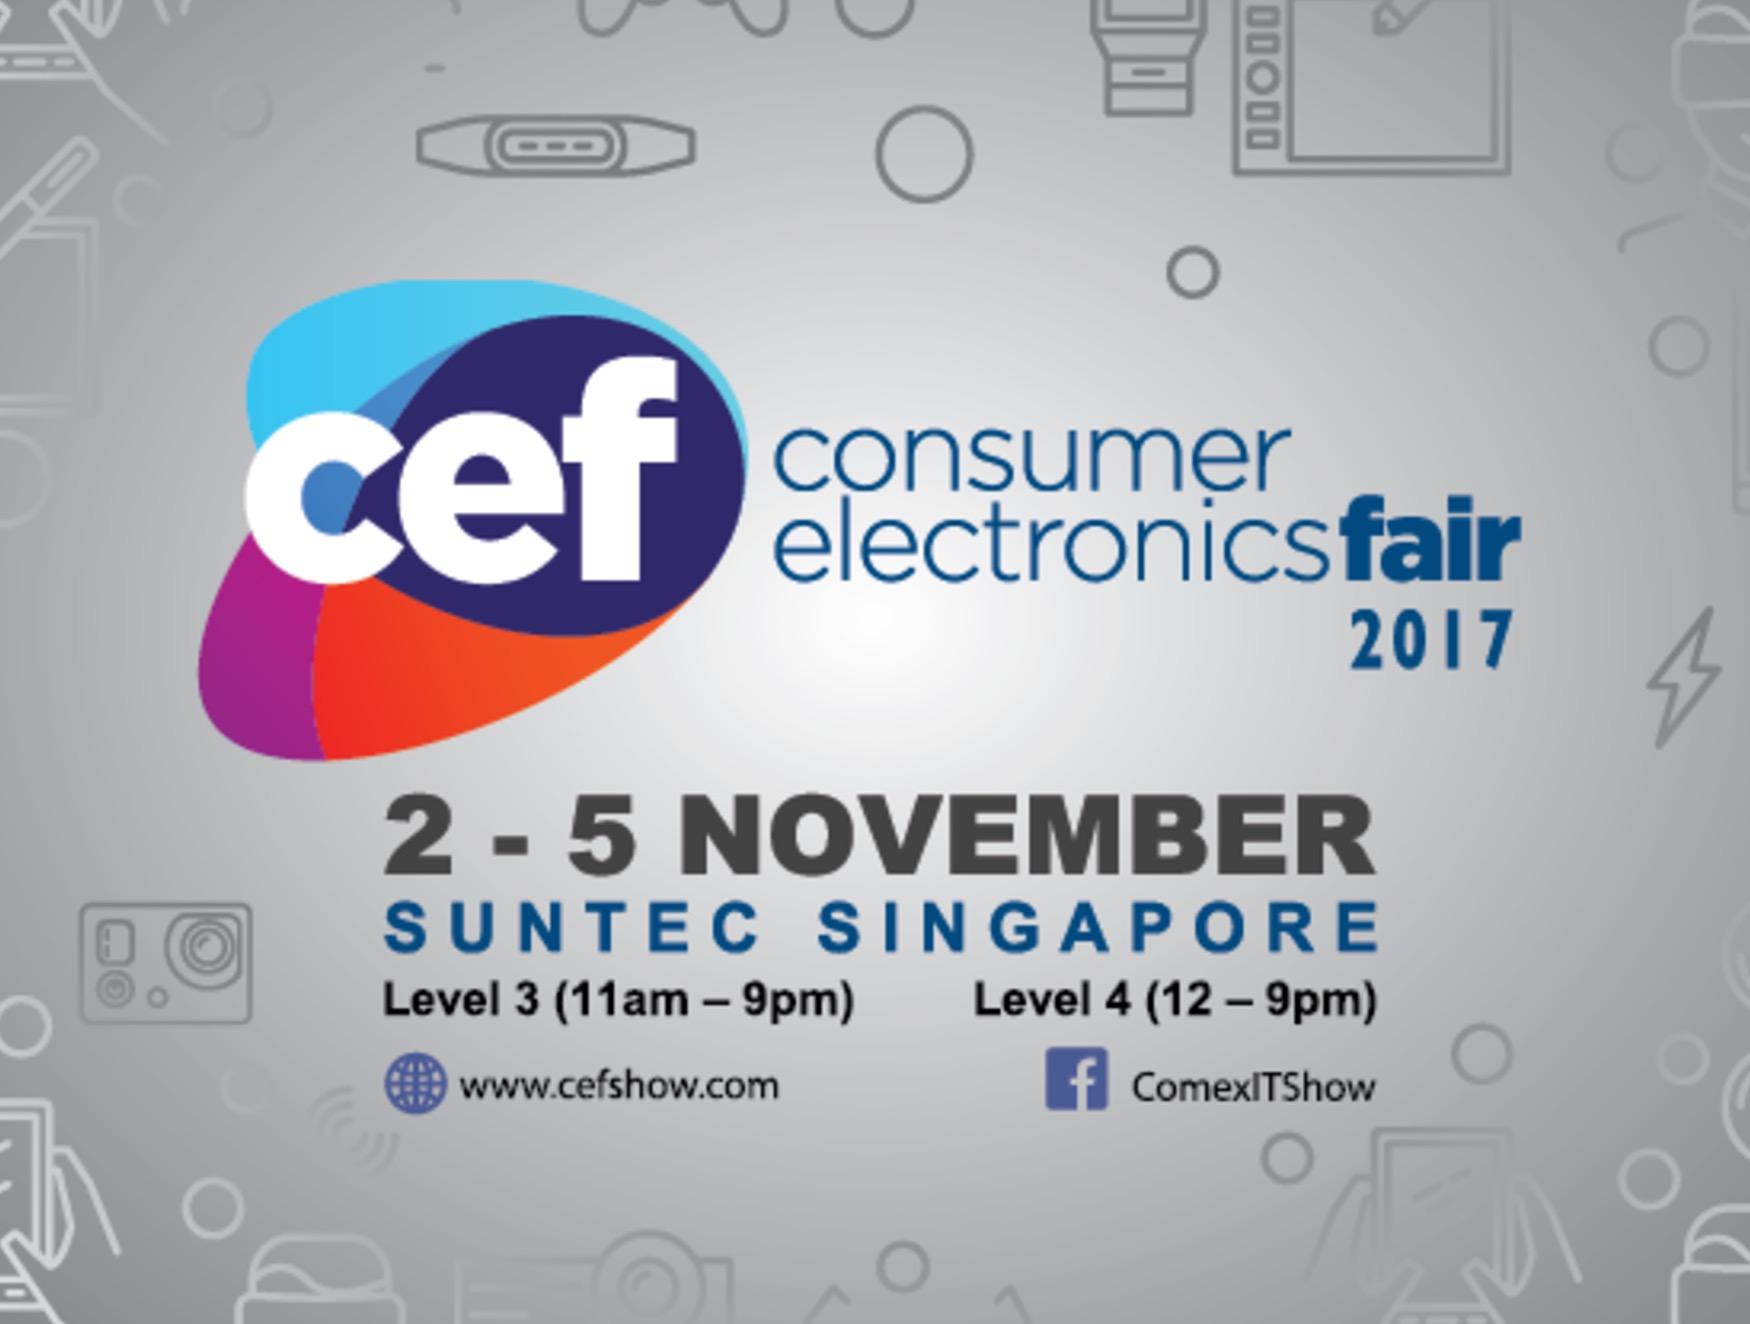 CEF Consumer Electronics Fair 2017   2-5 November   Suntec Singapore